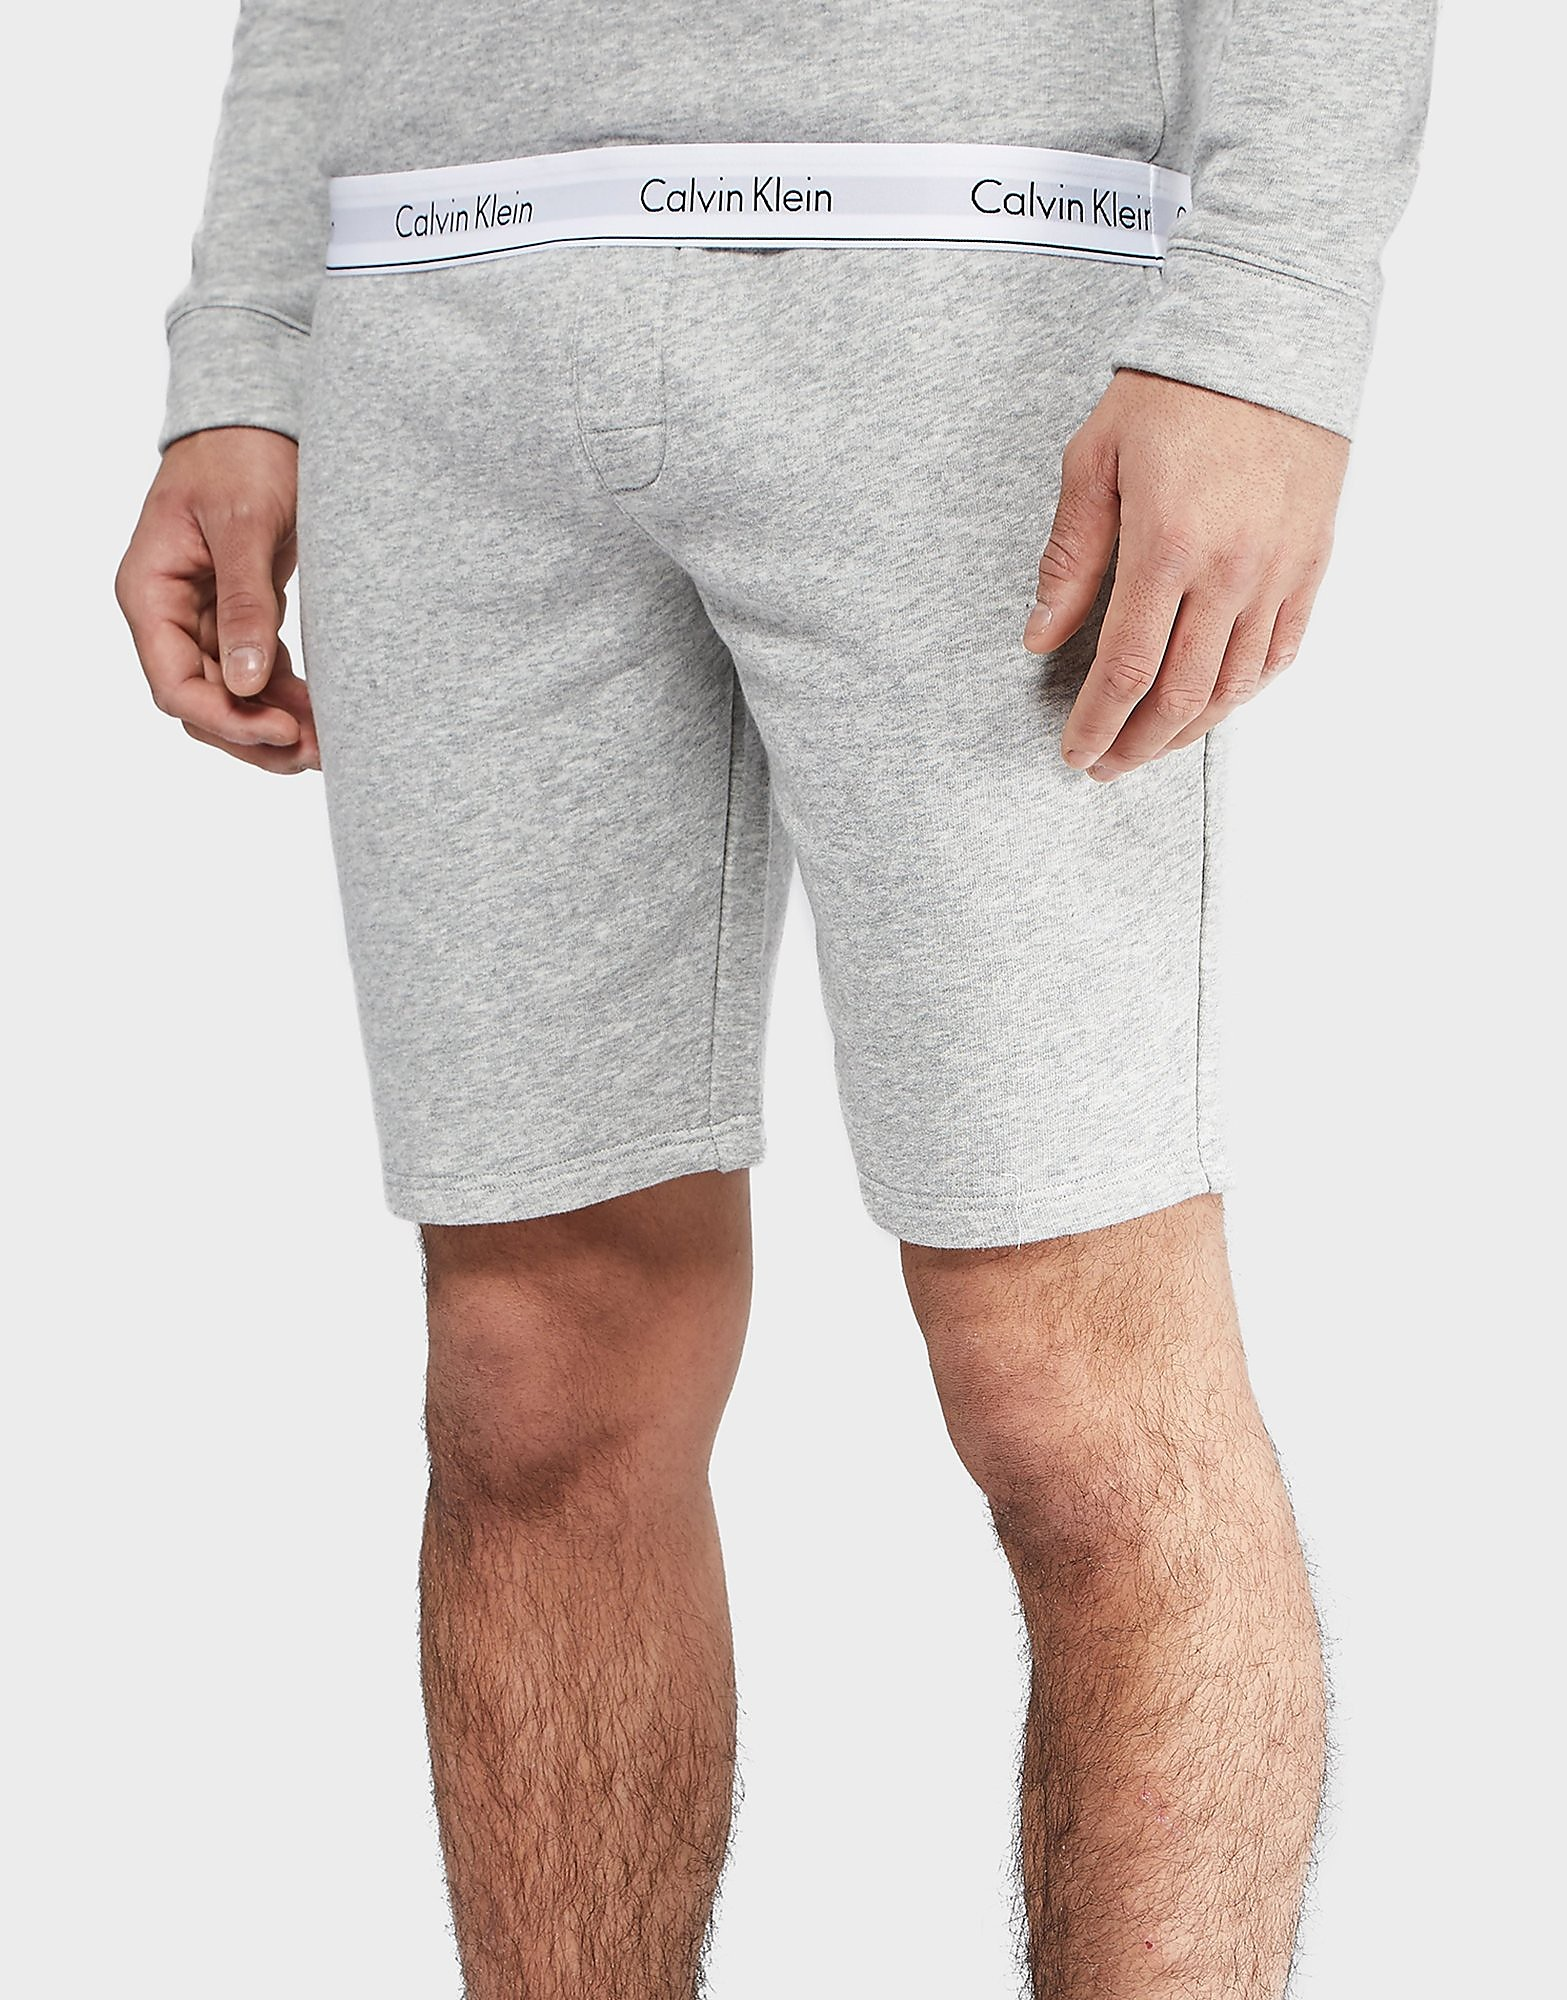 Calvin Klein Tape Shorts